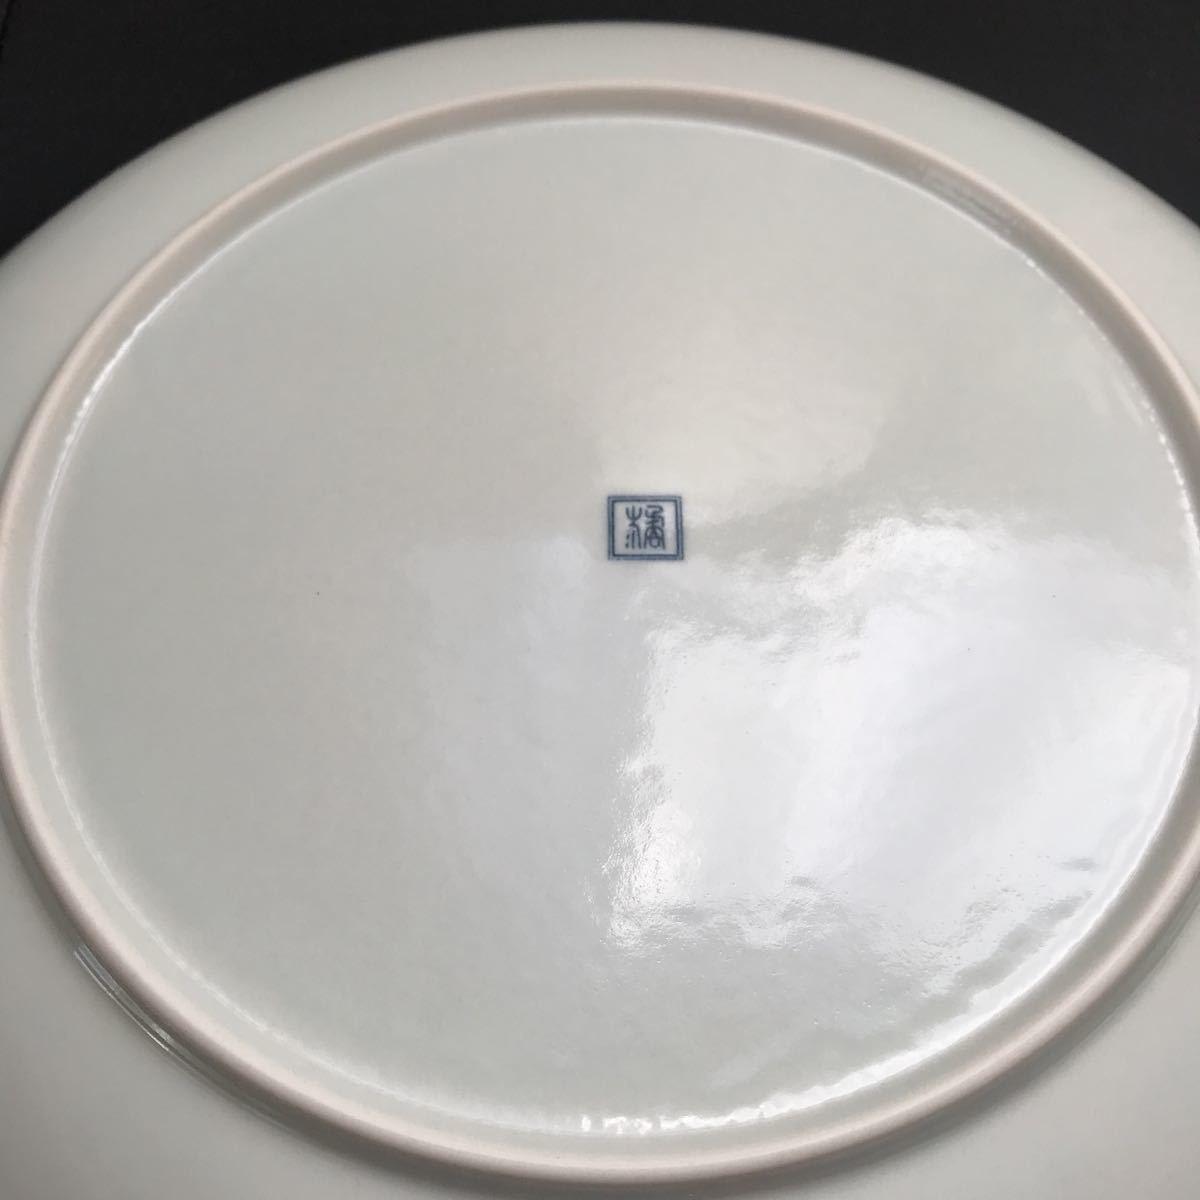 新品 未使用 たち吉 大皿 盛皿 和食器 日本製 MADE IN JAPAN_画像2